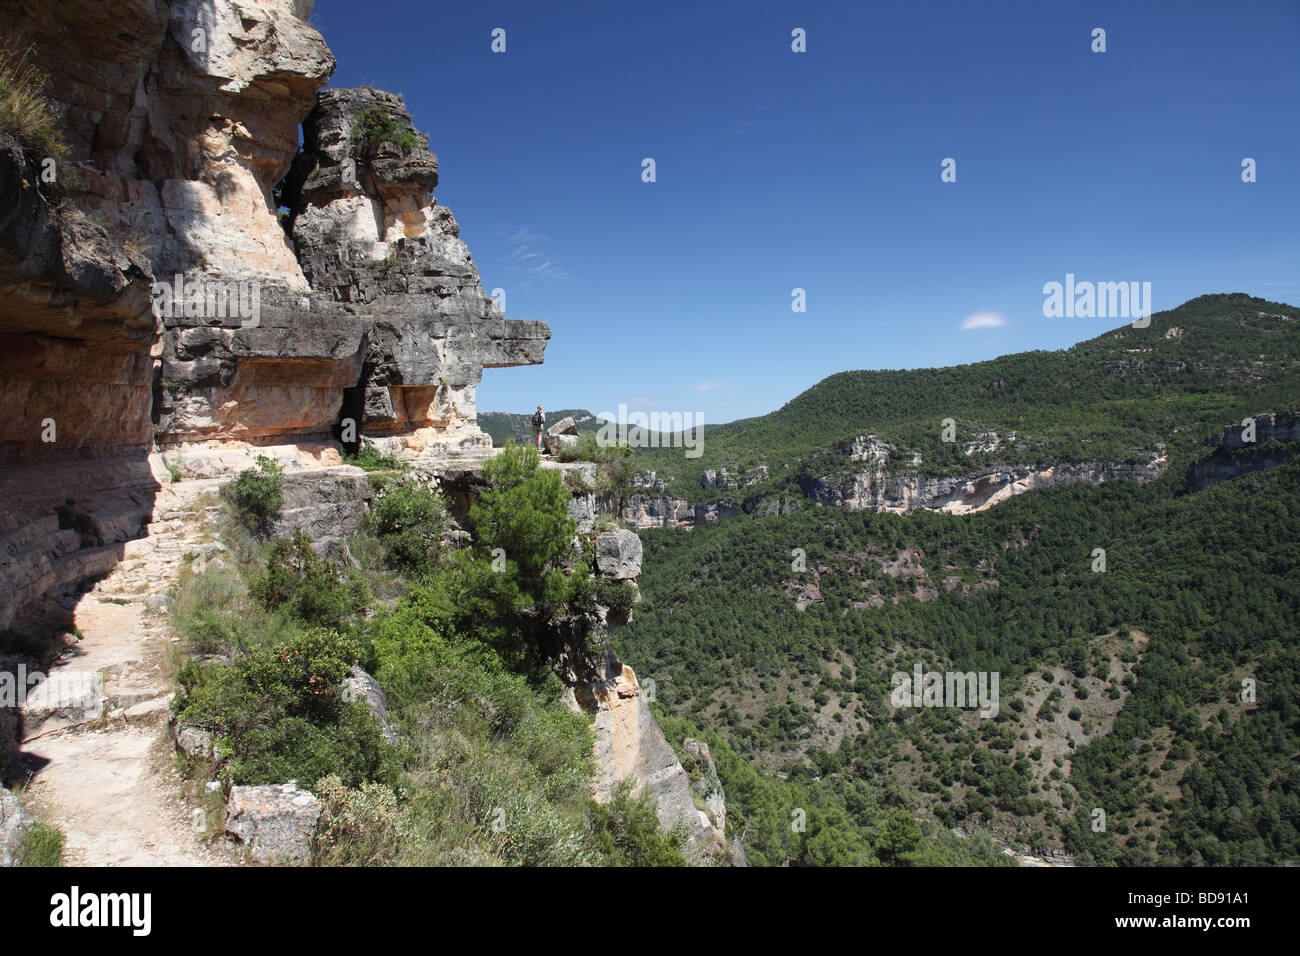 Hill Walker on Exposed Path La Trona Siurana Priorat Region Tarragona Province Catalonia Spain - Stock Image